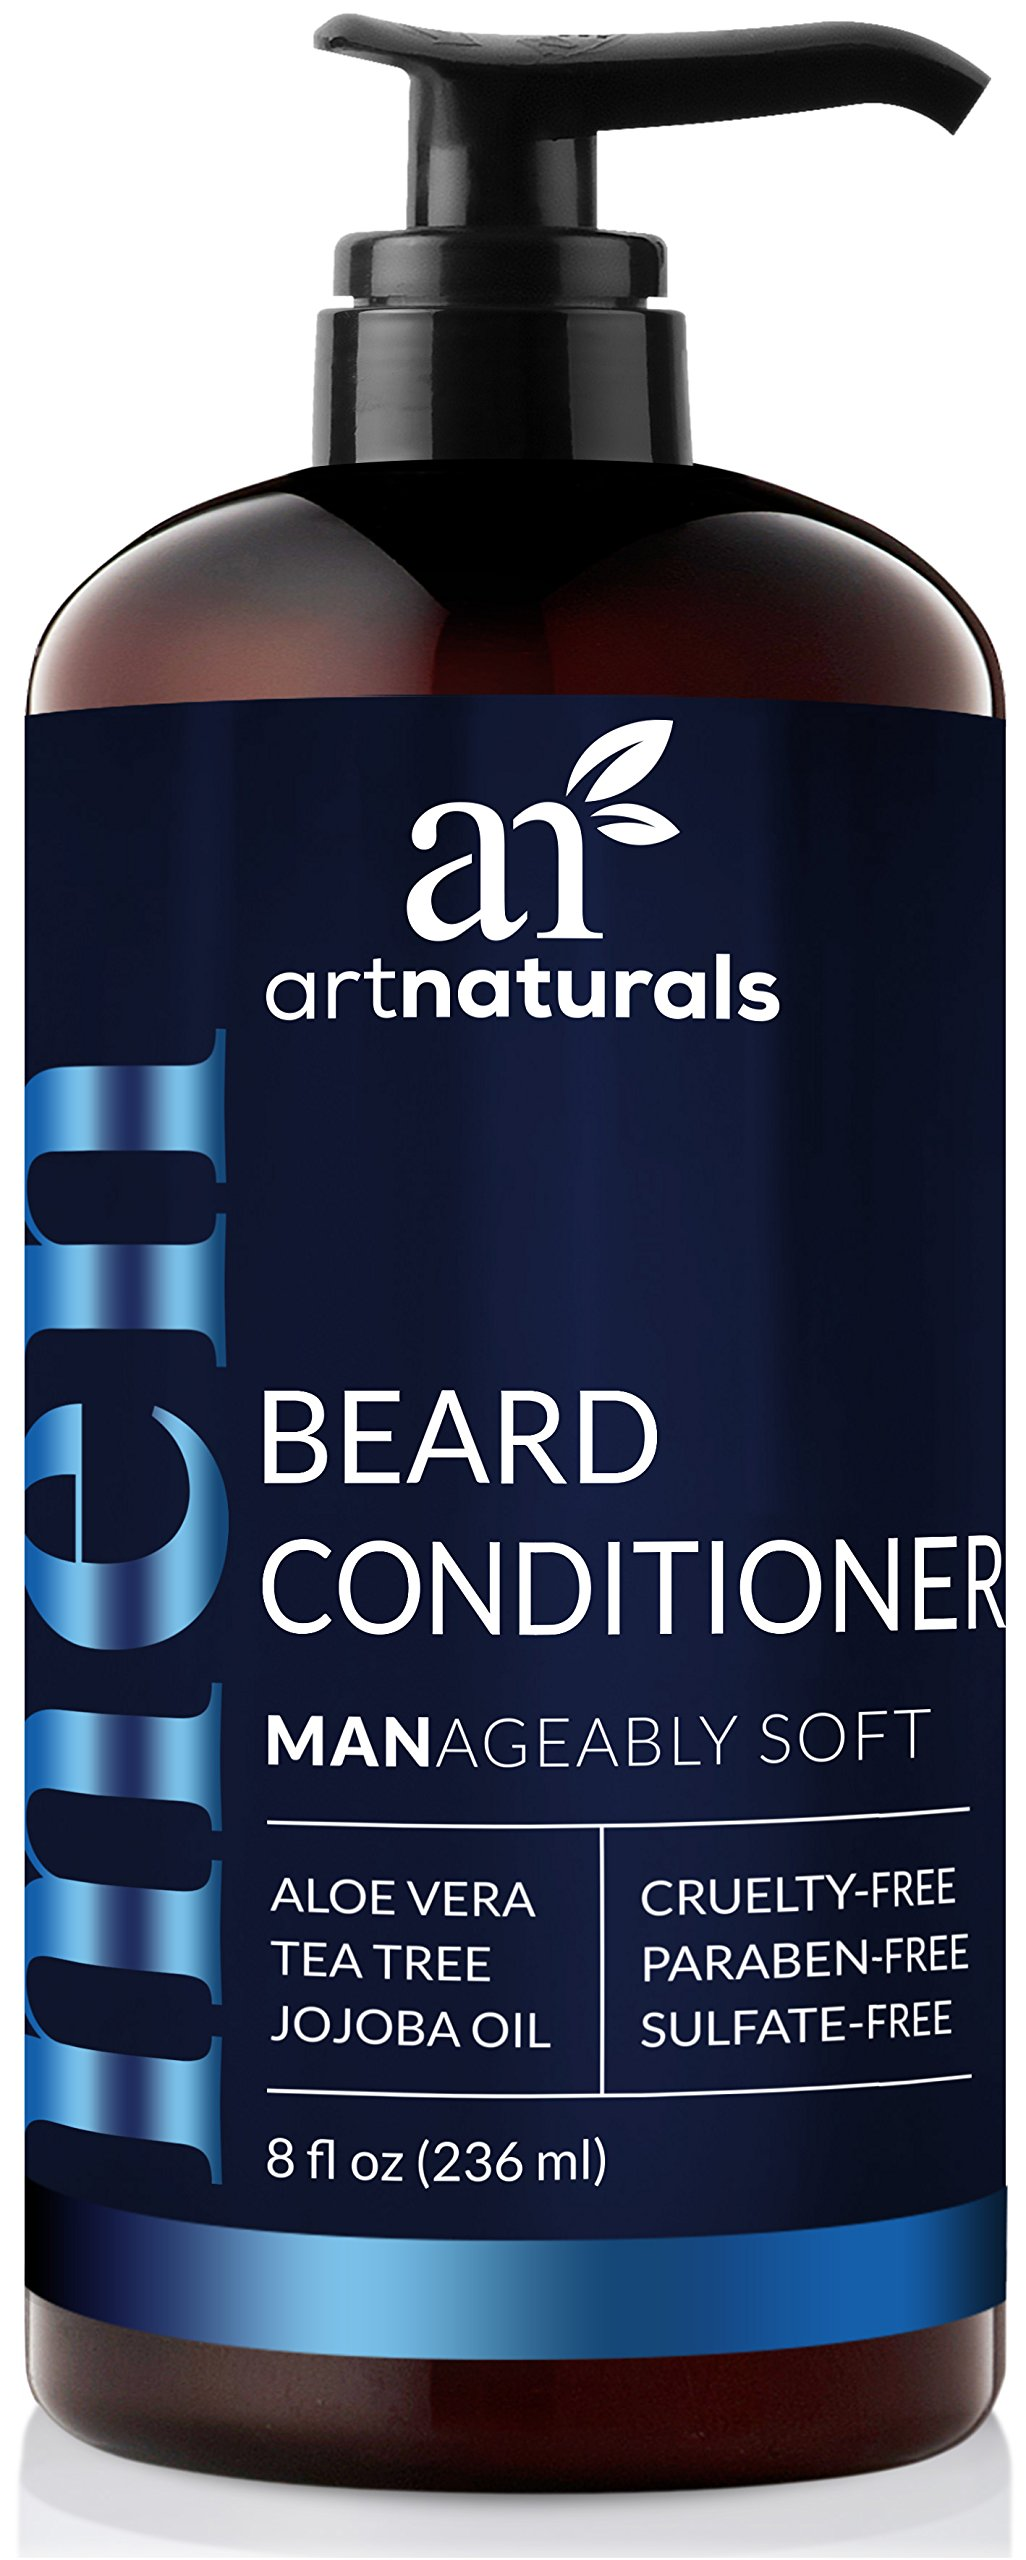 ArtNaturals Natural Beard Deep Conditioner - (8 Fl Oz/236ml) - Infused with Aloe Vera, Tea Tree and Jojoba Oil - Sulfate Free